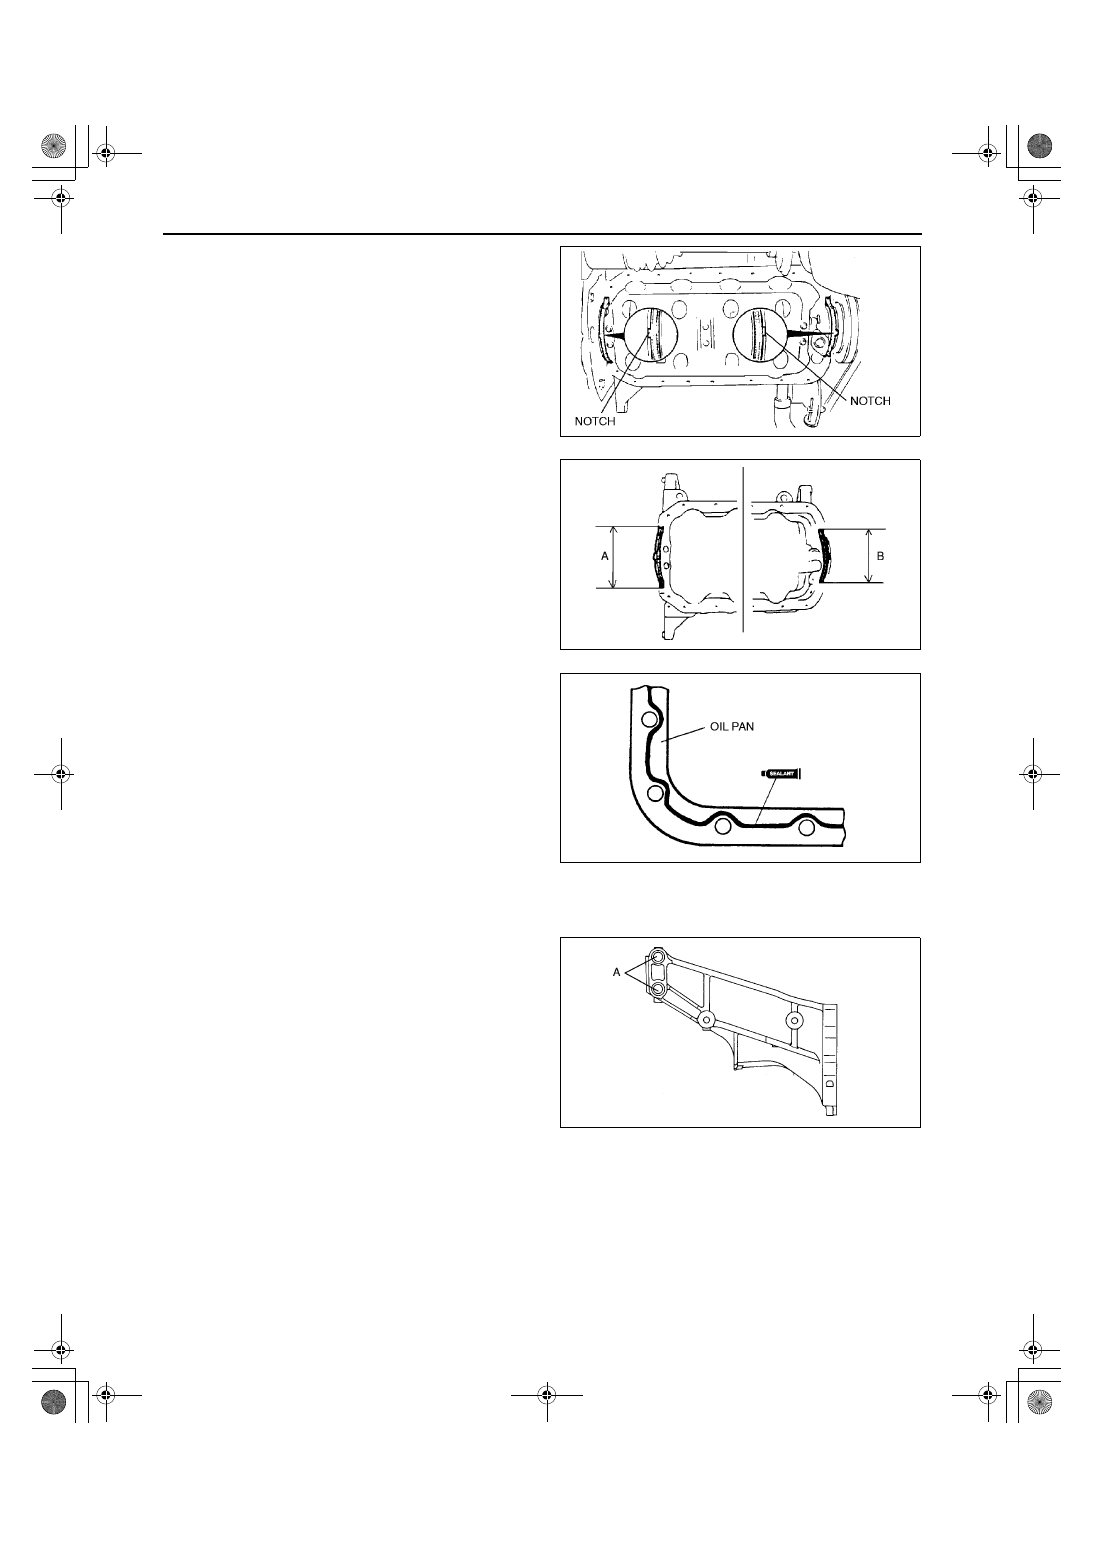 g15m 5 manual transaxle today manual guide trends sample u2022 rh brookejasmine co 5 Speed Manual Transmission Identification Getrag 5 Speed Manual